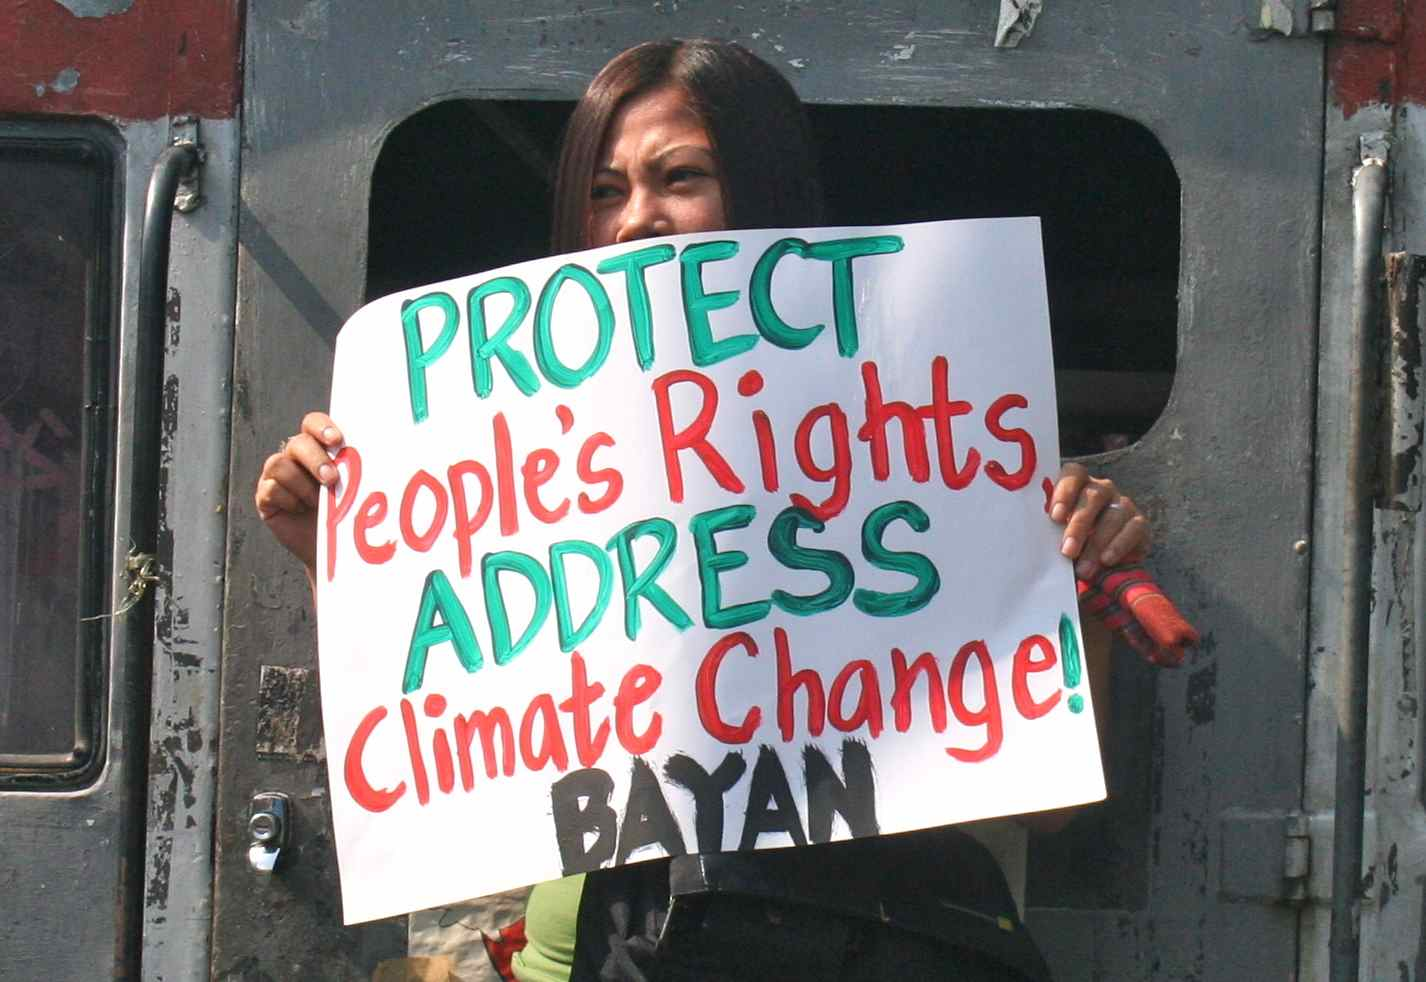 COP 21 | Groups hit Aquino climate change 'hypocrisy'